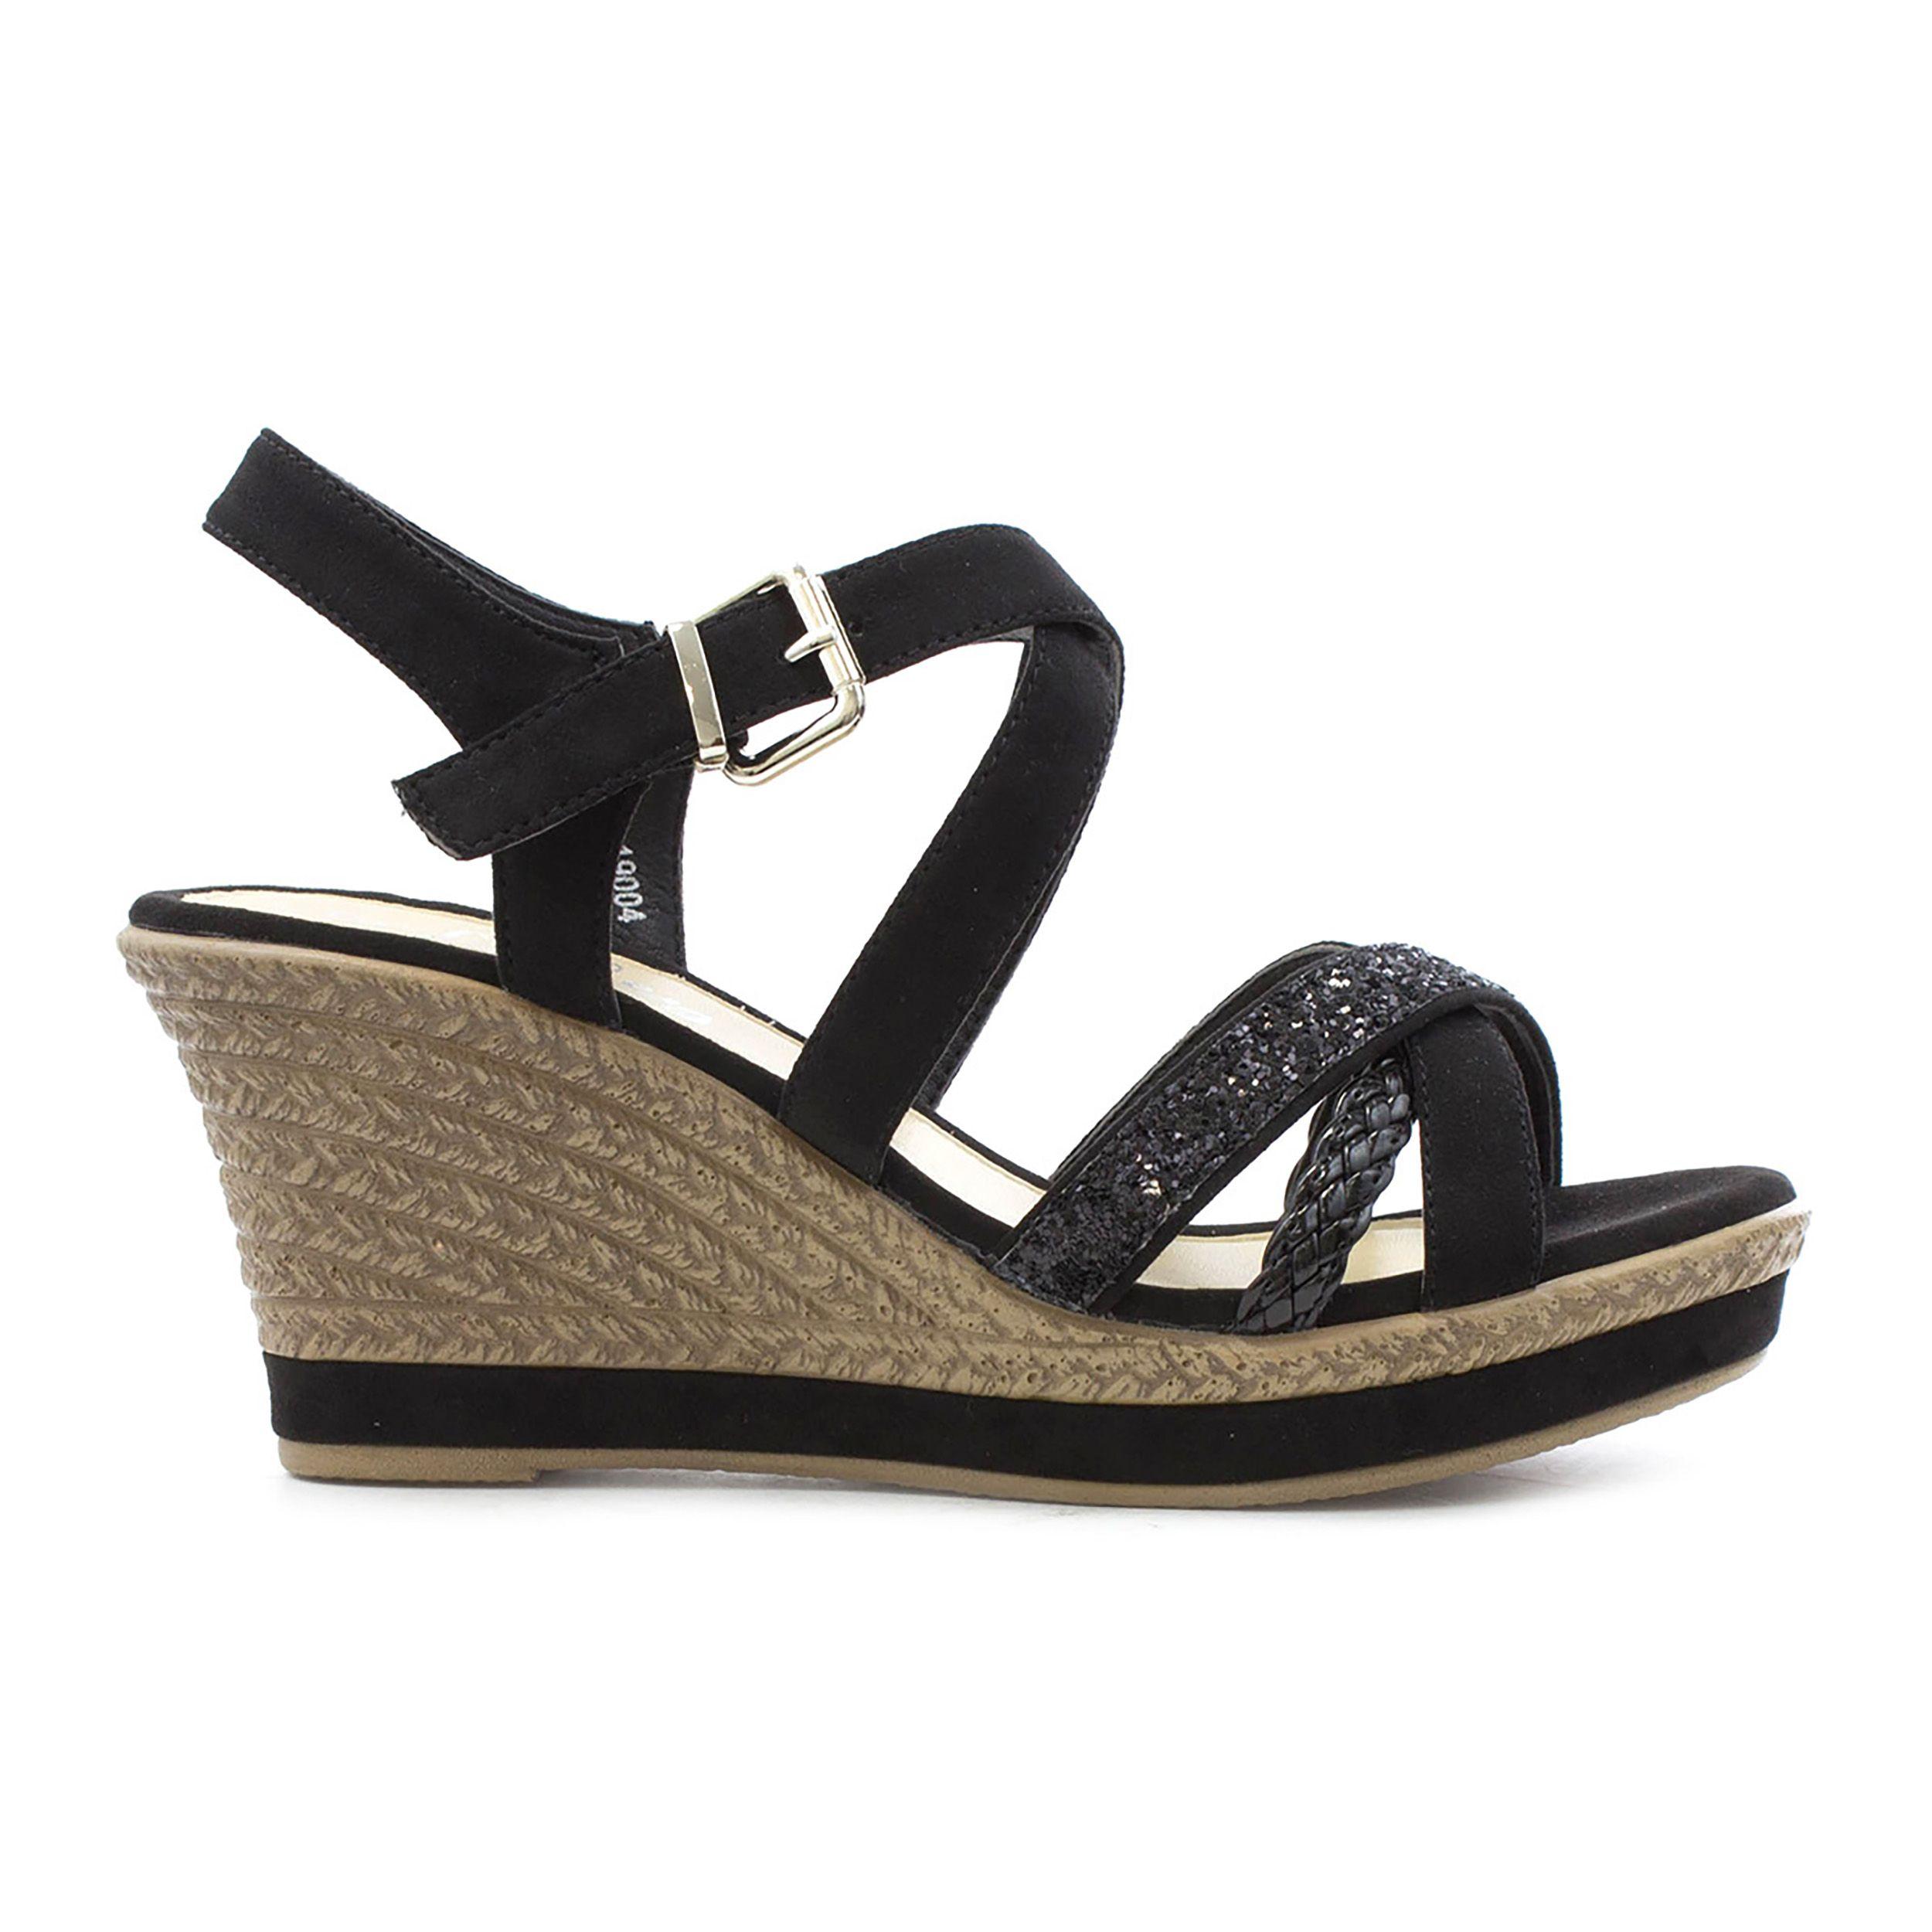 2eb72a01ba0 Cushion Walk Womens Black High Wedge Sandal   SHOE ZONE   SS18 ...